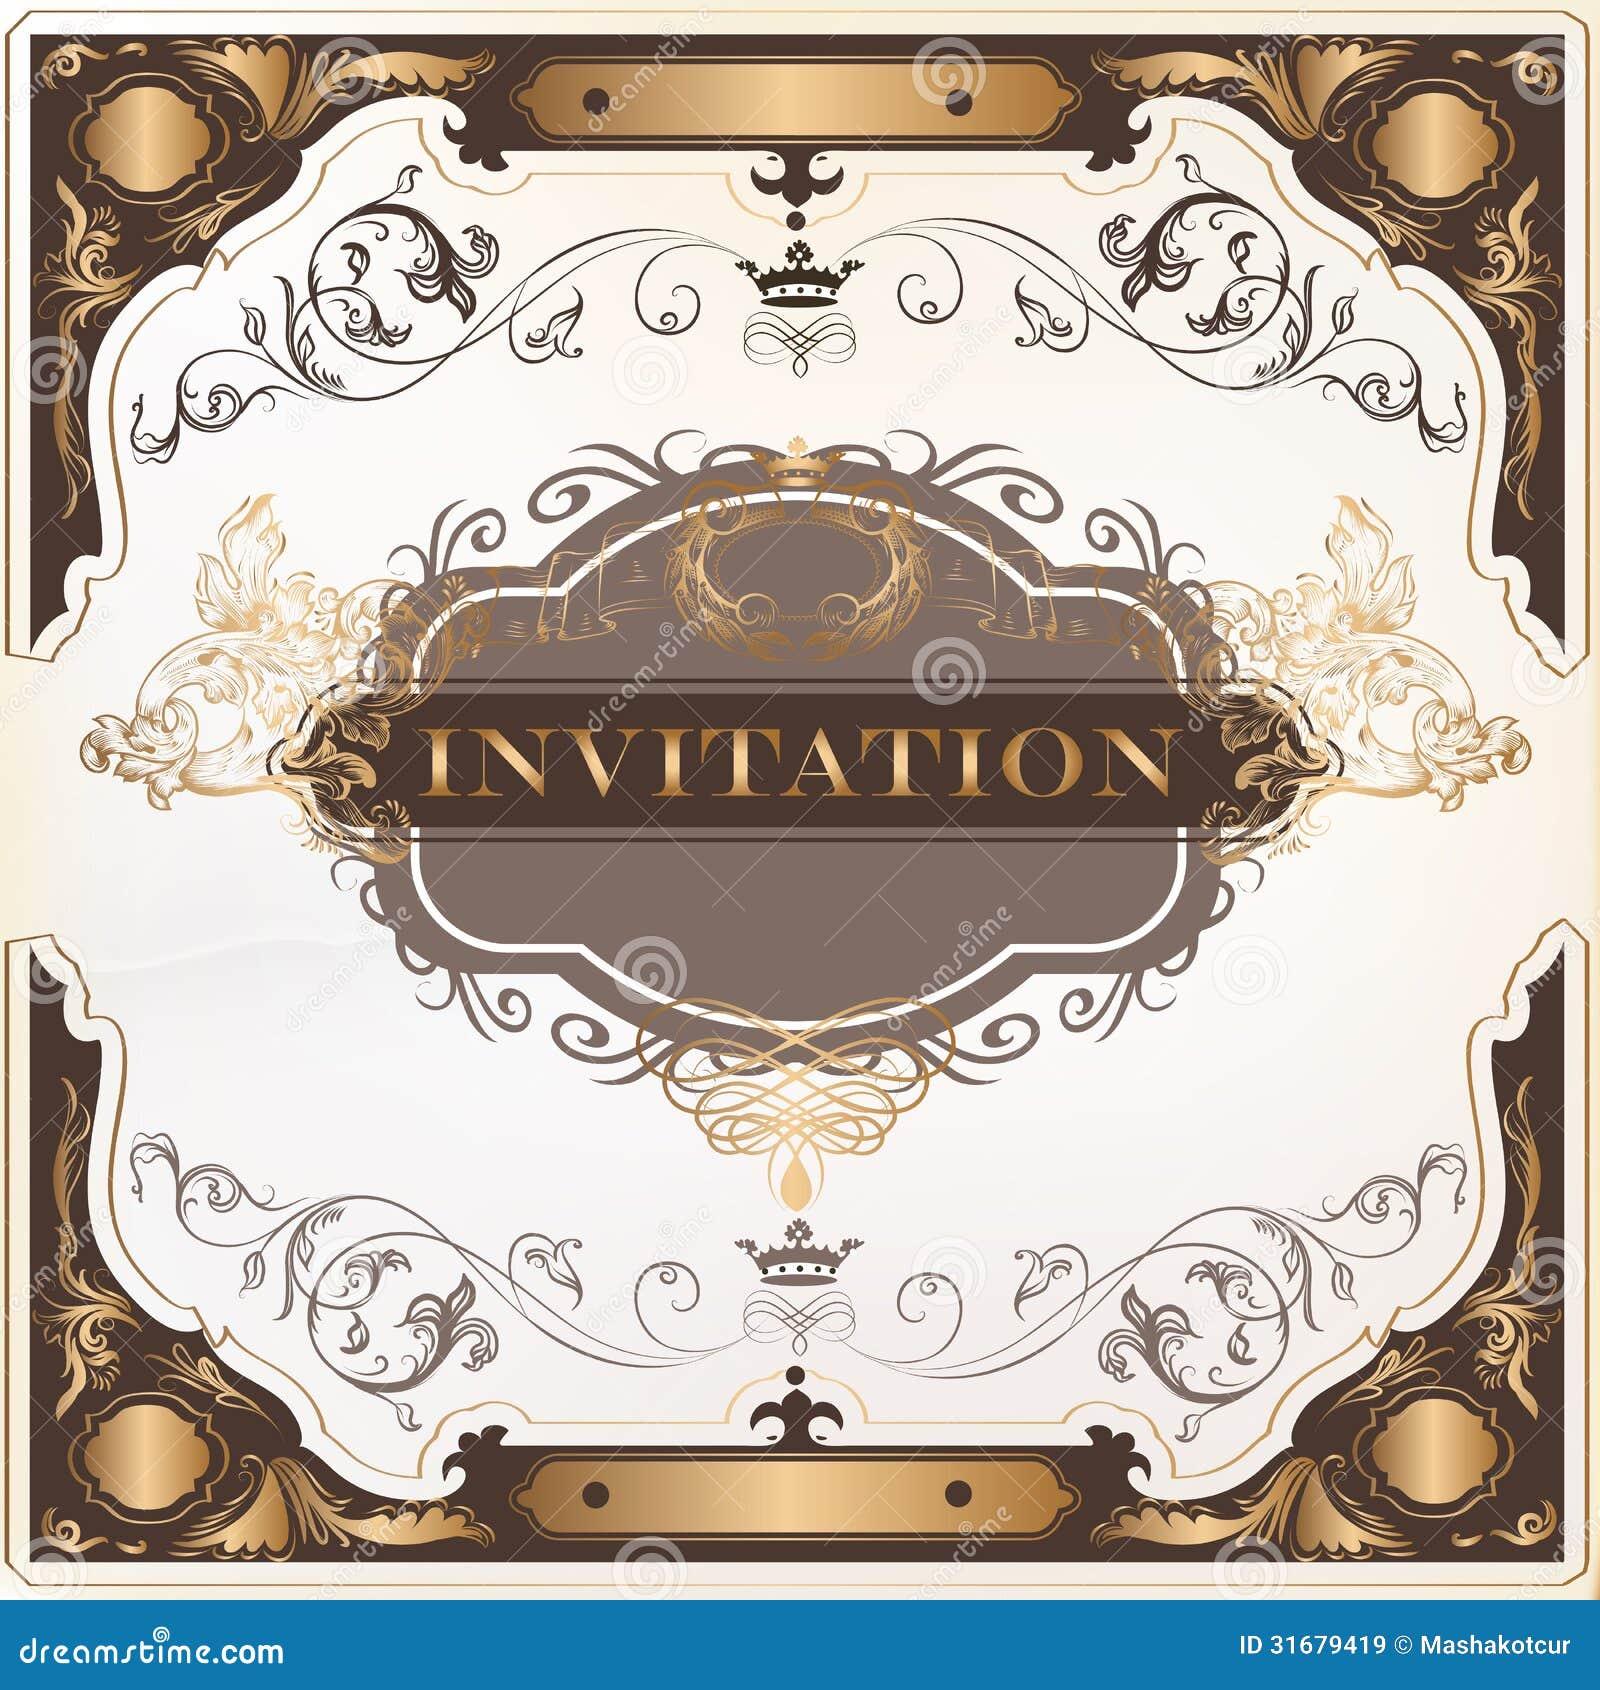 Elegant invitation vector card for design stock vector elegant invitation vector card for design stopboris Choice Image